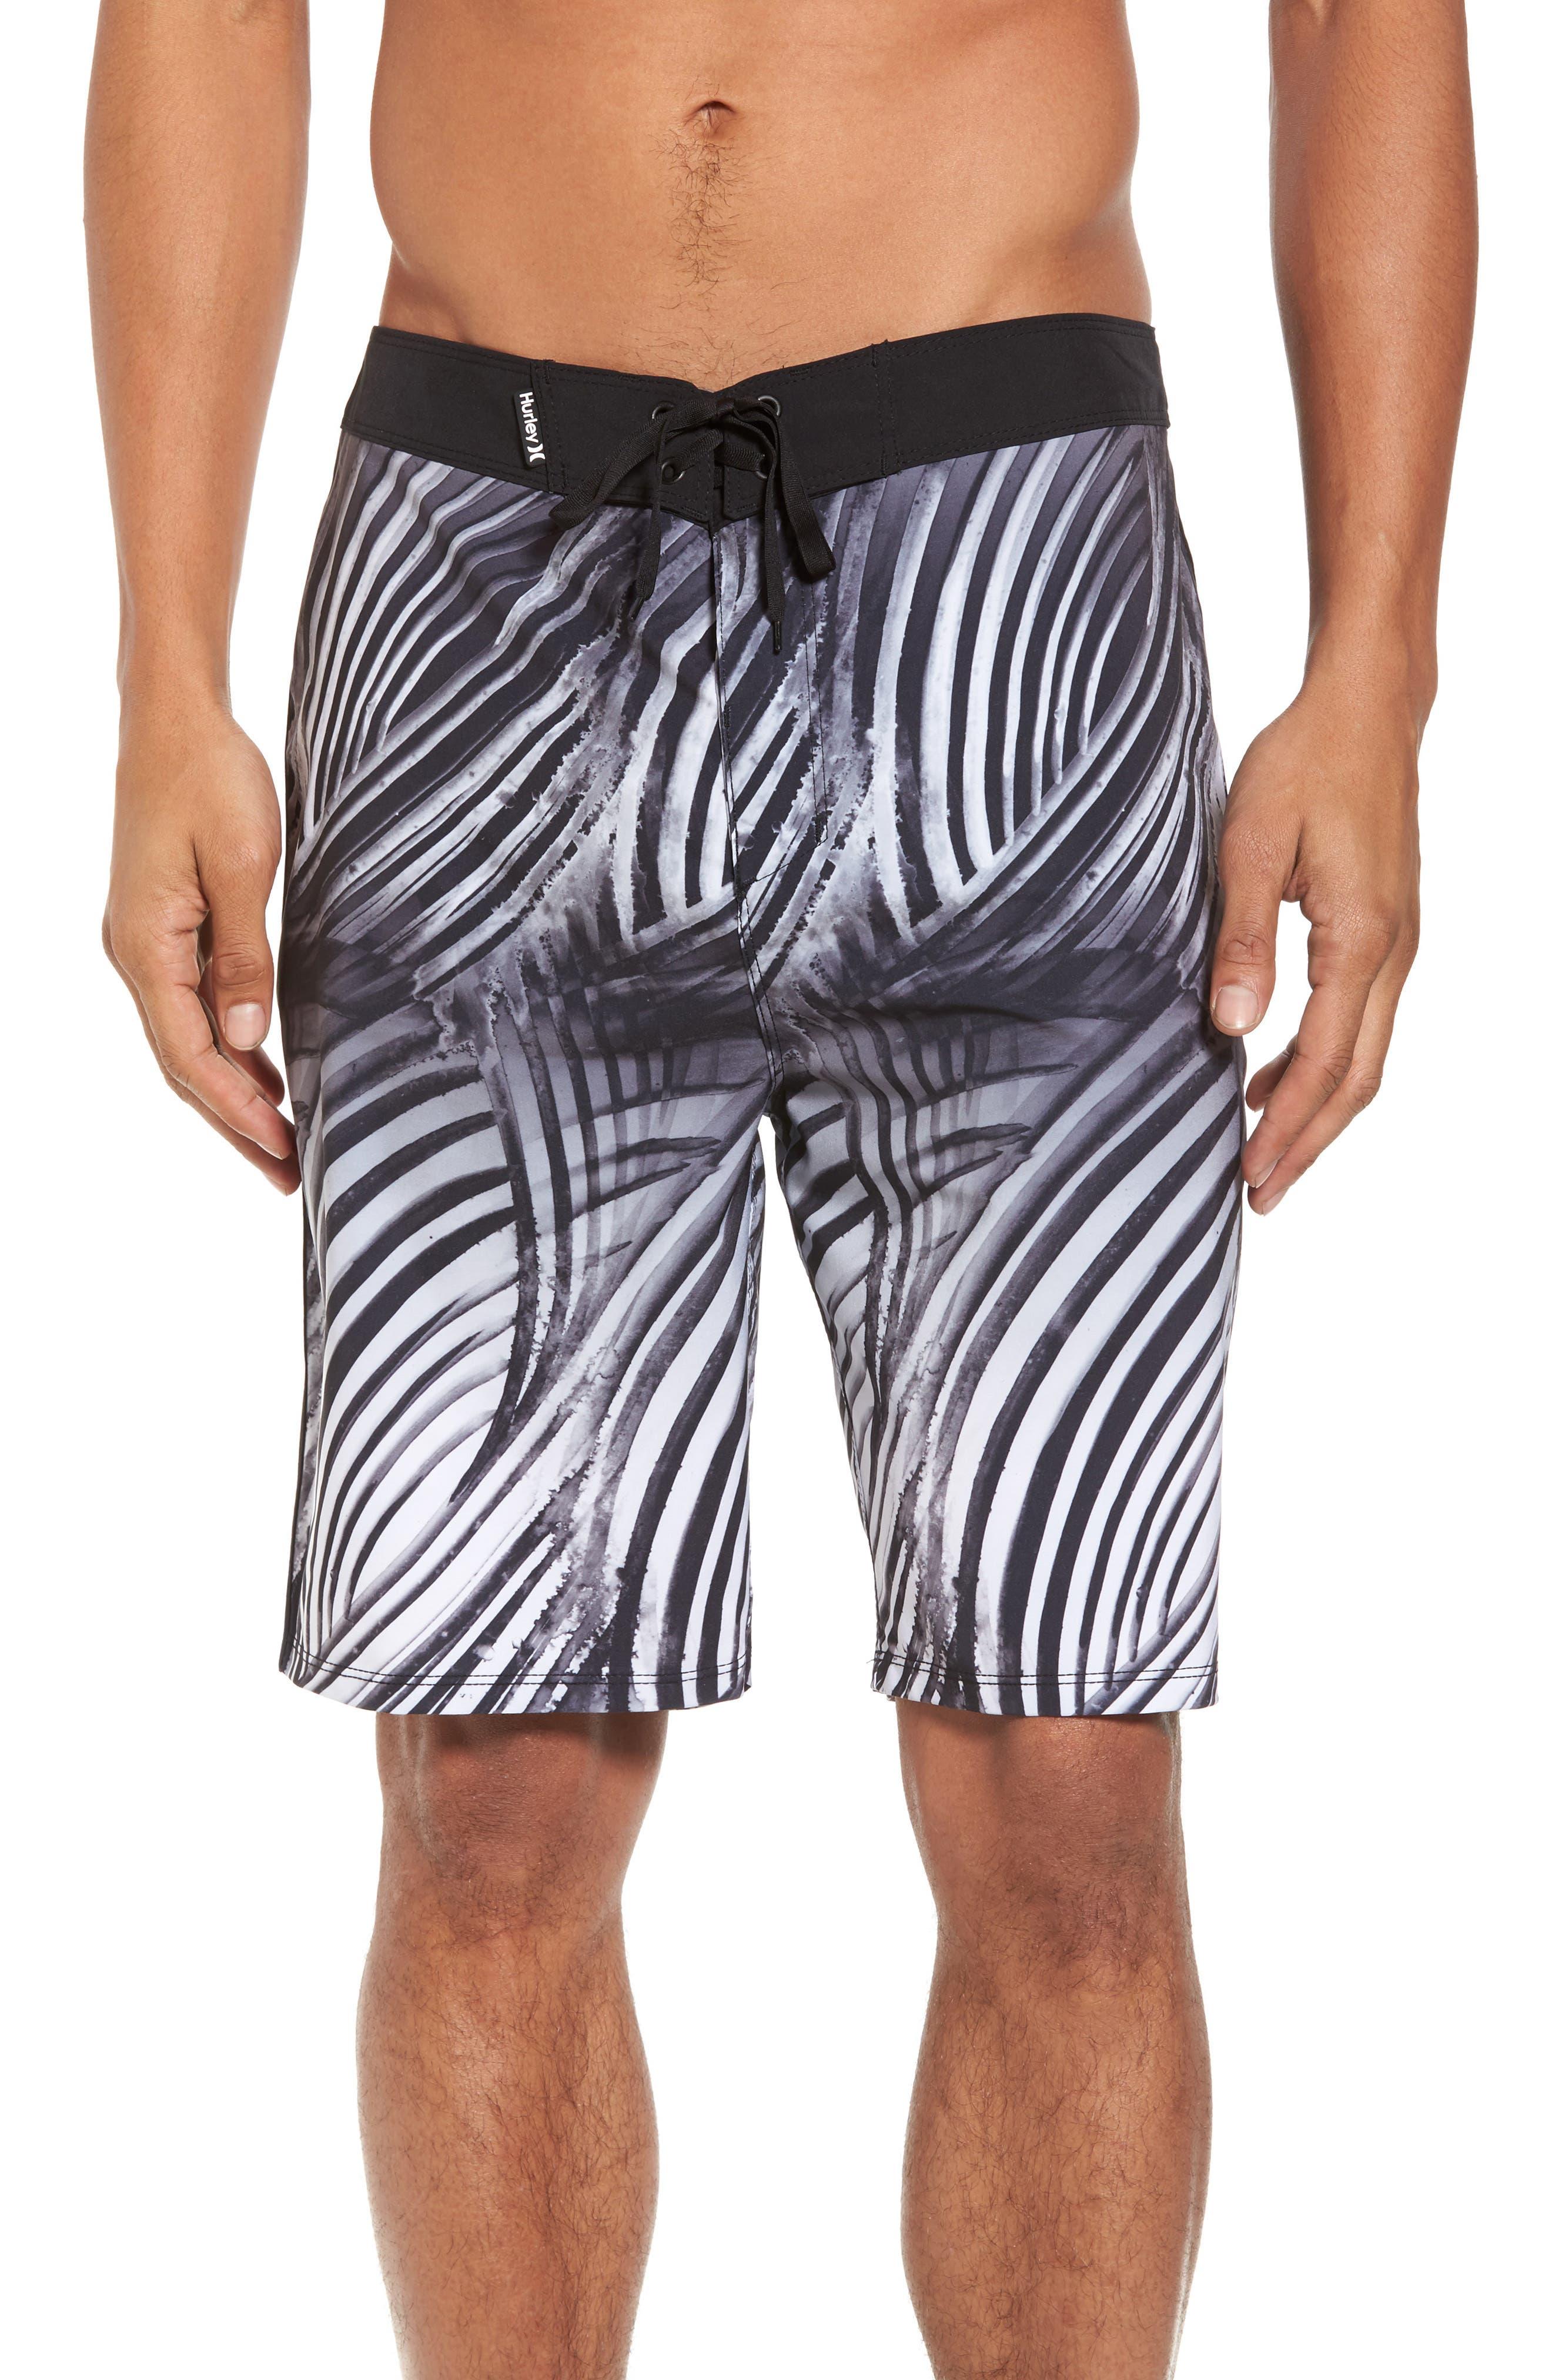 Phantom Crest Board Shorts,                             Main thumbnail 1, color,                             Black